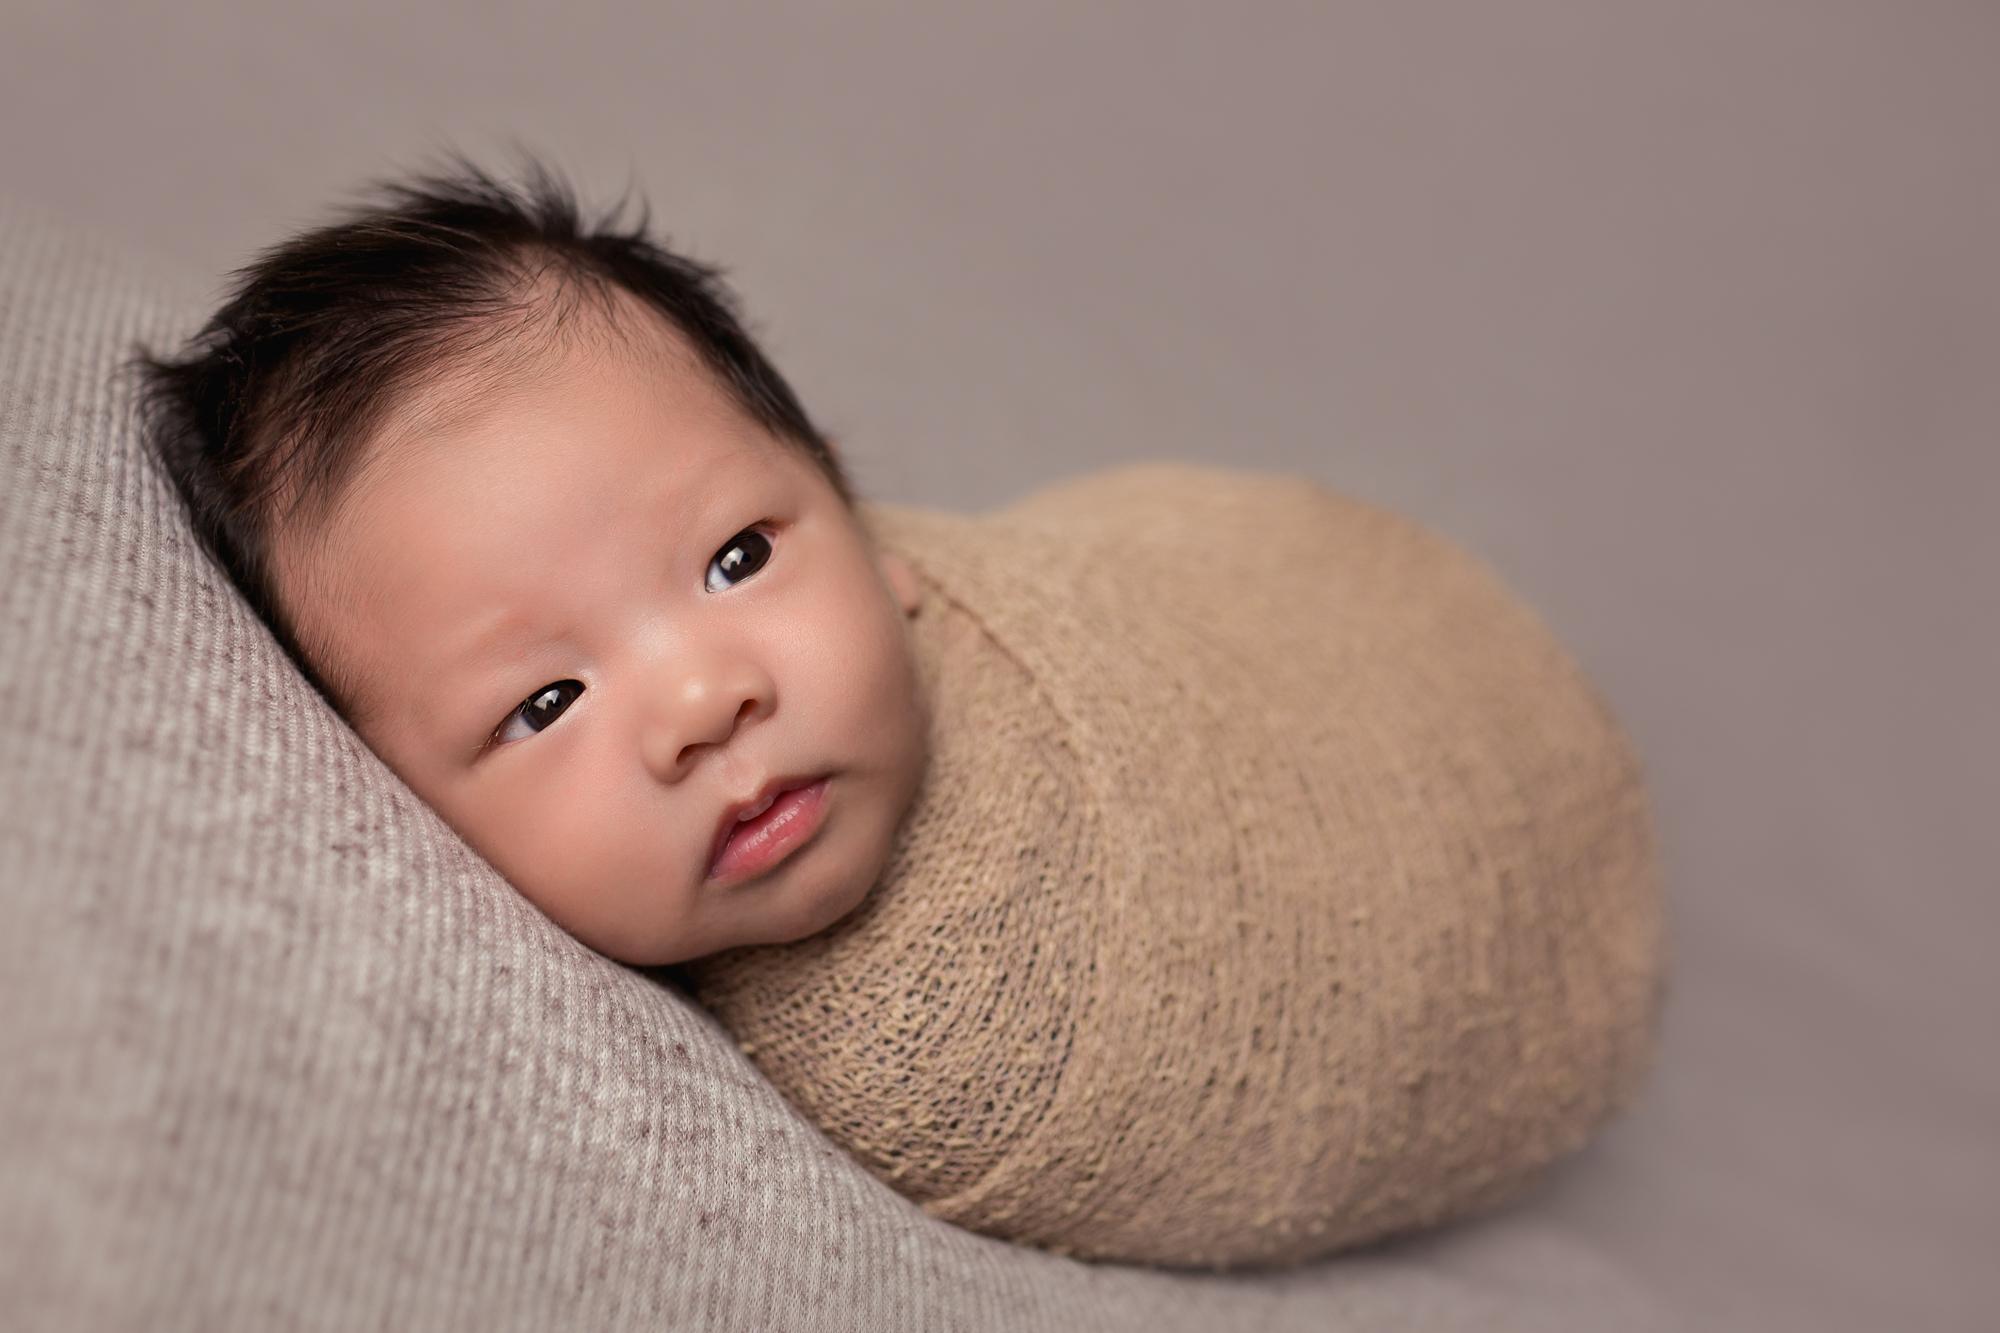 Wide awake Baby Rome during Newborn Pictures in San Diego, CA by Studio Freyja Newborns